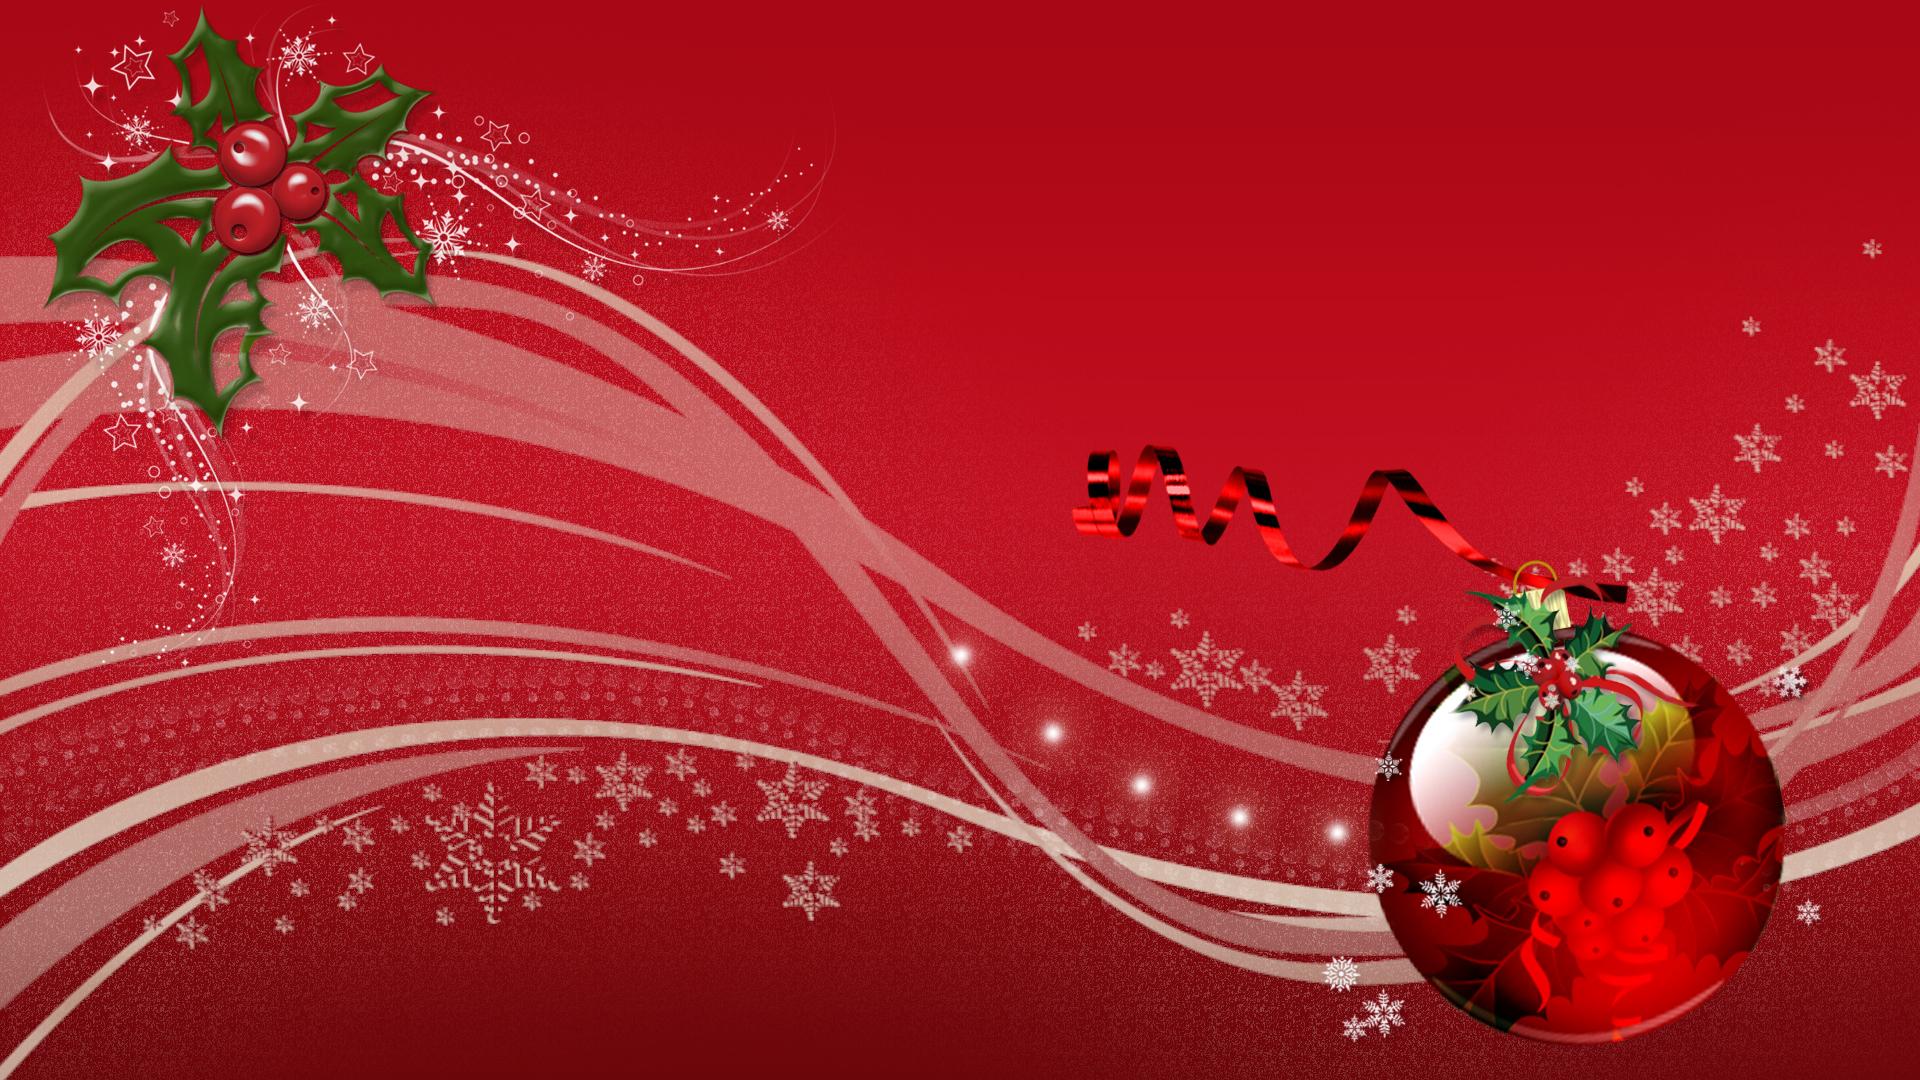 Red Christmas Screensavers 8401 1920 x 1080 1920x1080